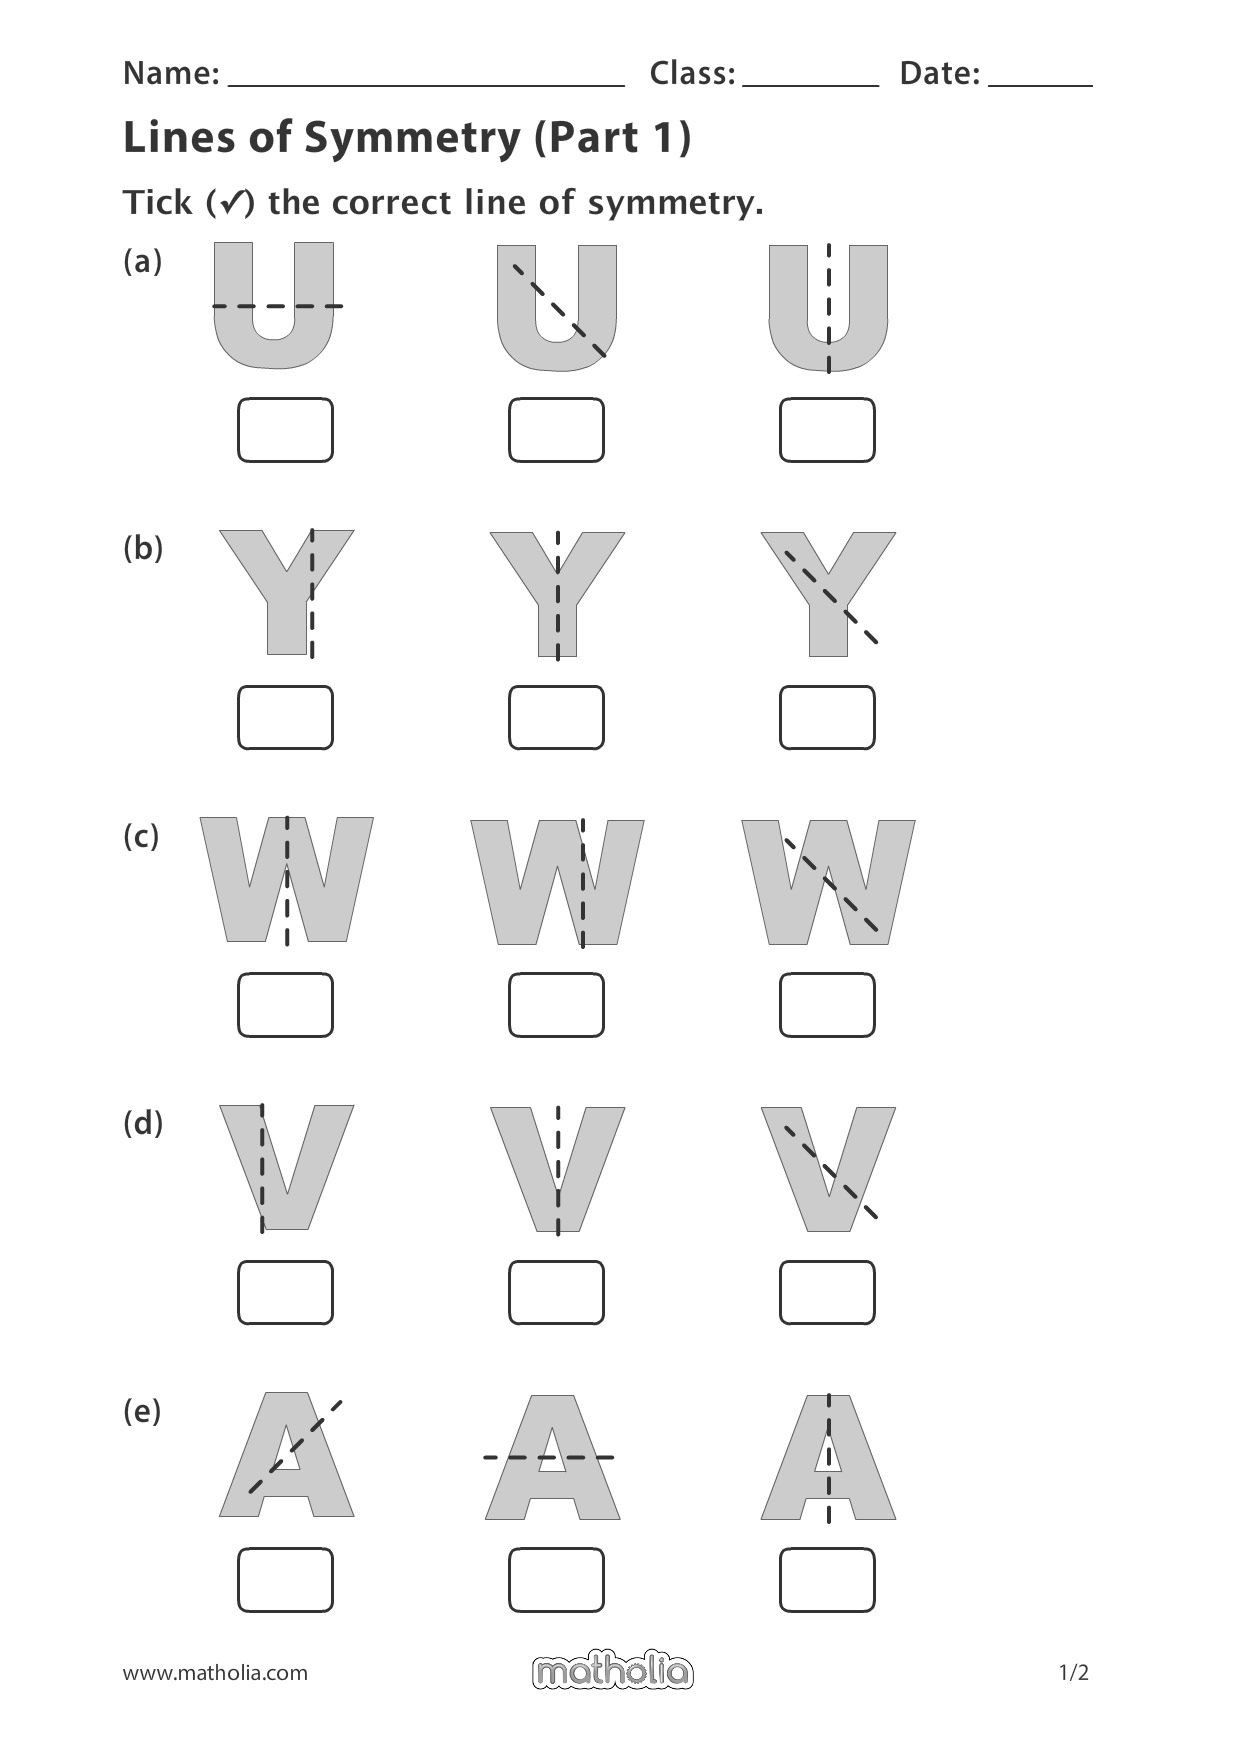 Line Of Symmetry Worksheet Lines Of Symmetry Part 1 In 2020